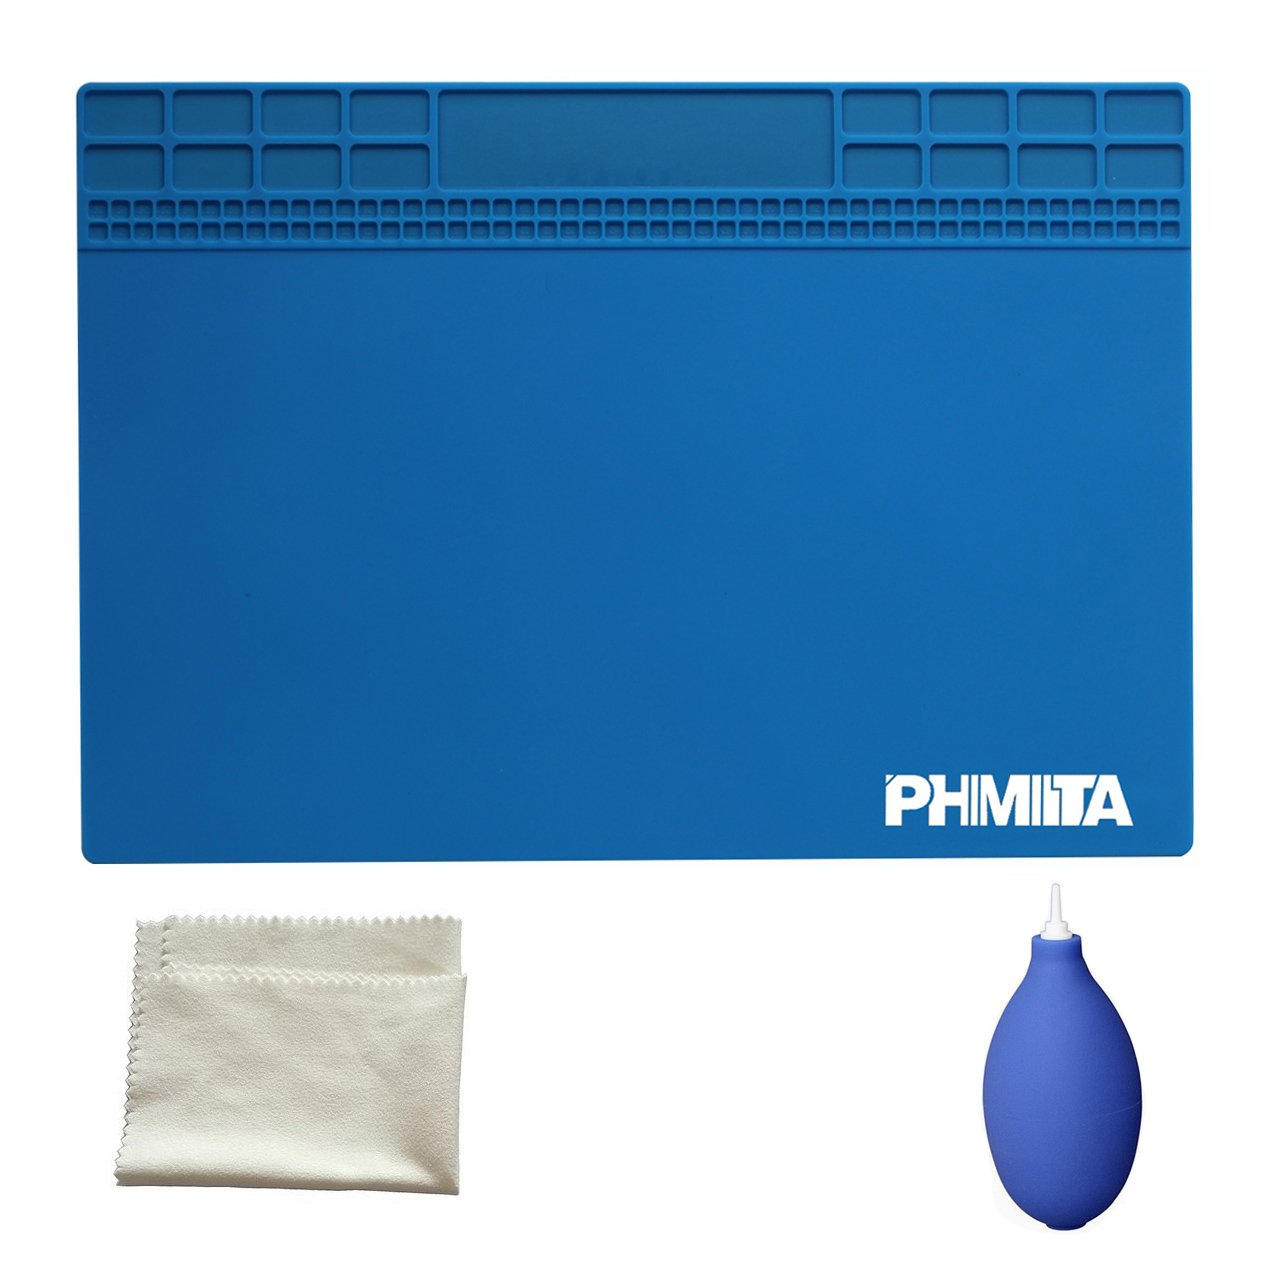 PHIMIITA tapis de soudure Heat Resistant 500° C Mini Soldering Working Station Insulation Pad for Phone Soldering Iron and more Electronic Repair (big, blue)